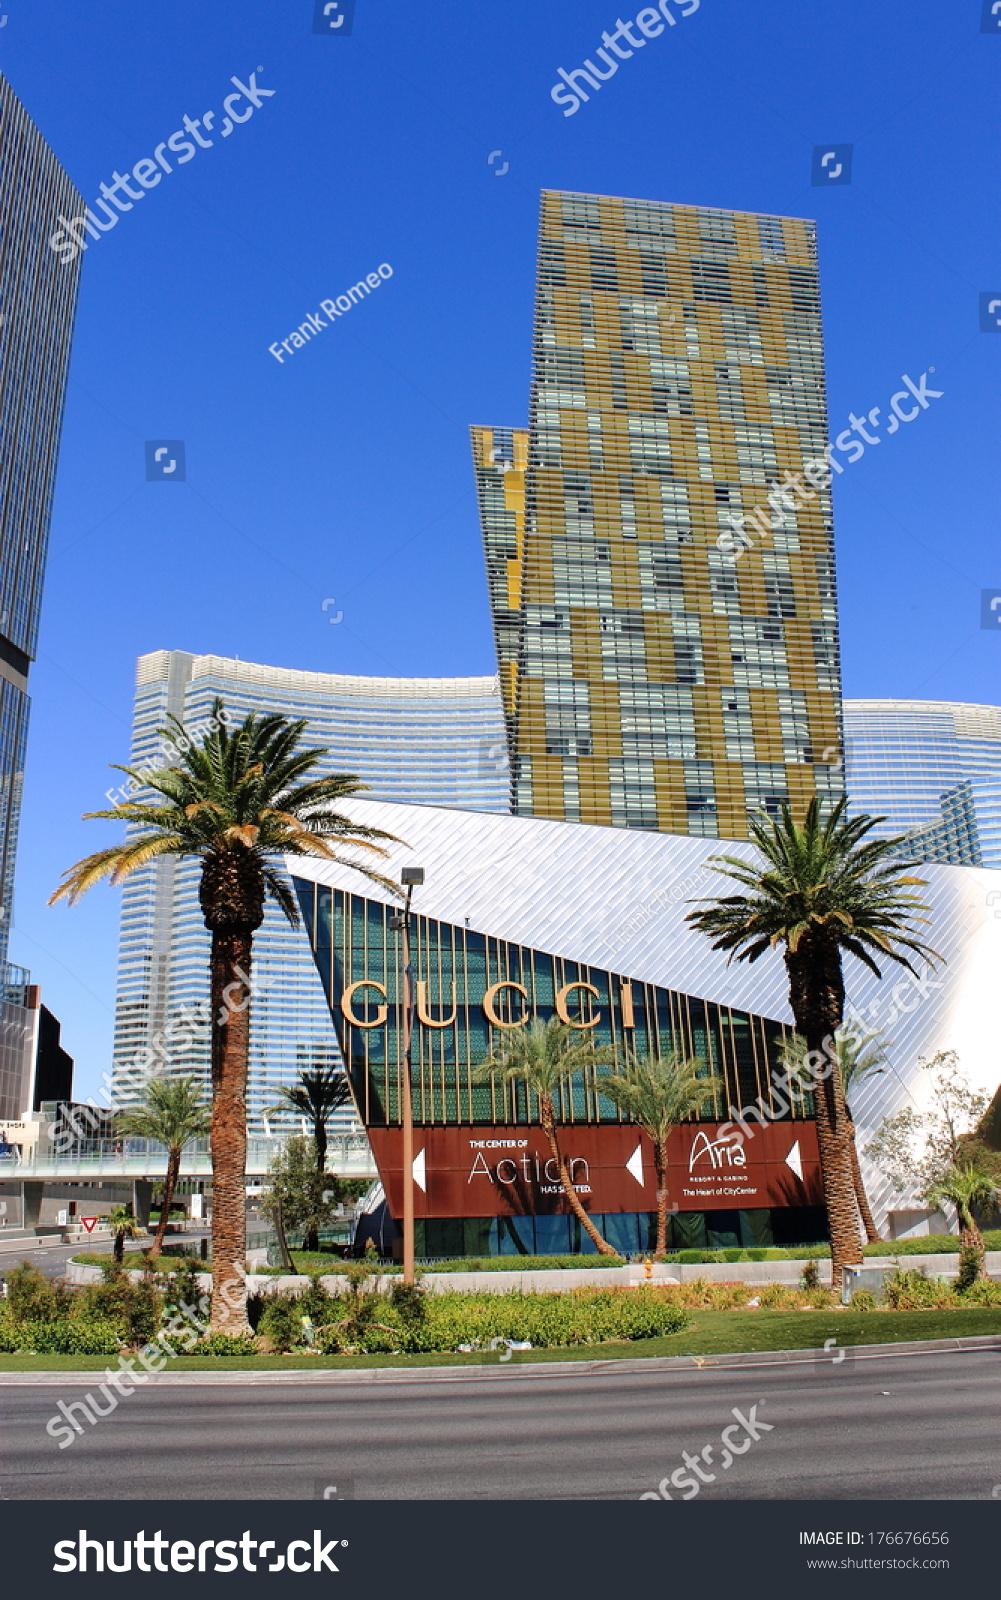 Las Vegas Fourth of July 2019 Weekend   Bachelor Vegas